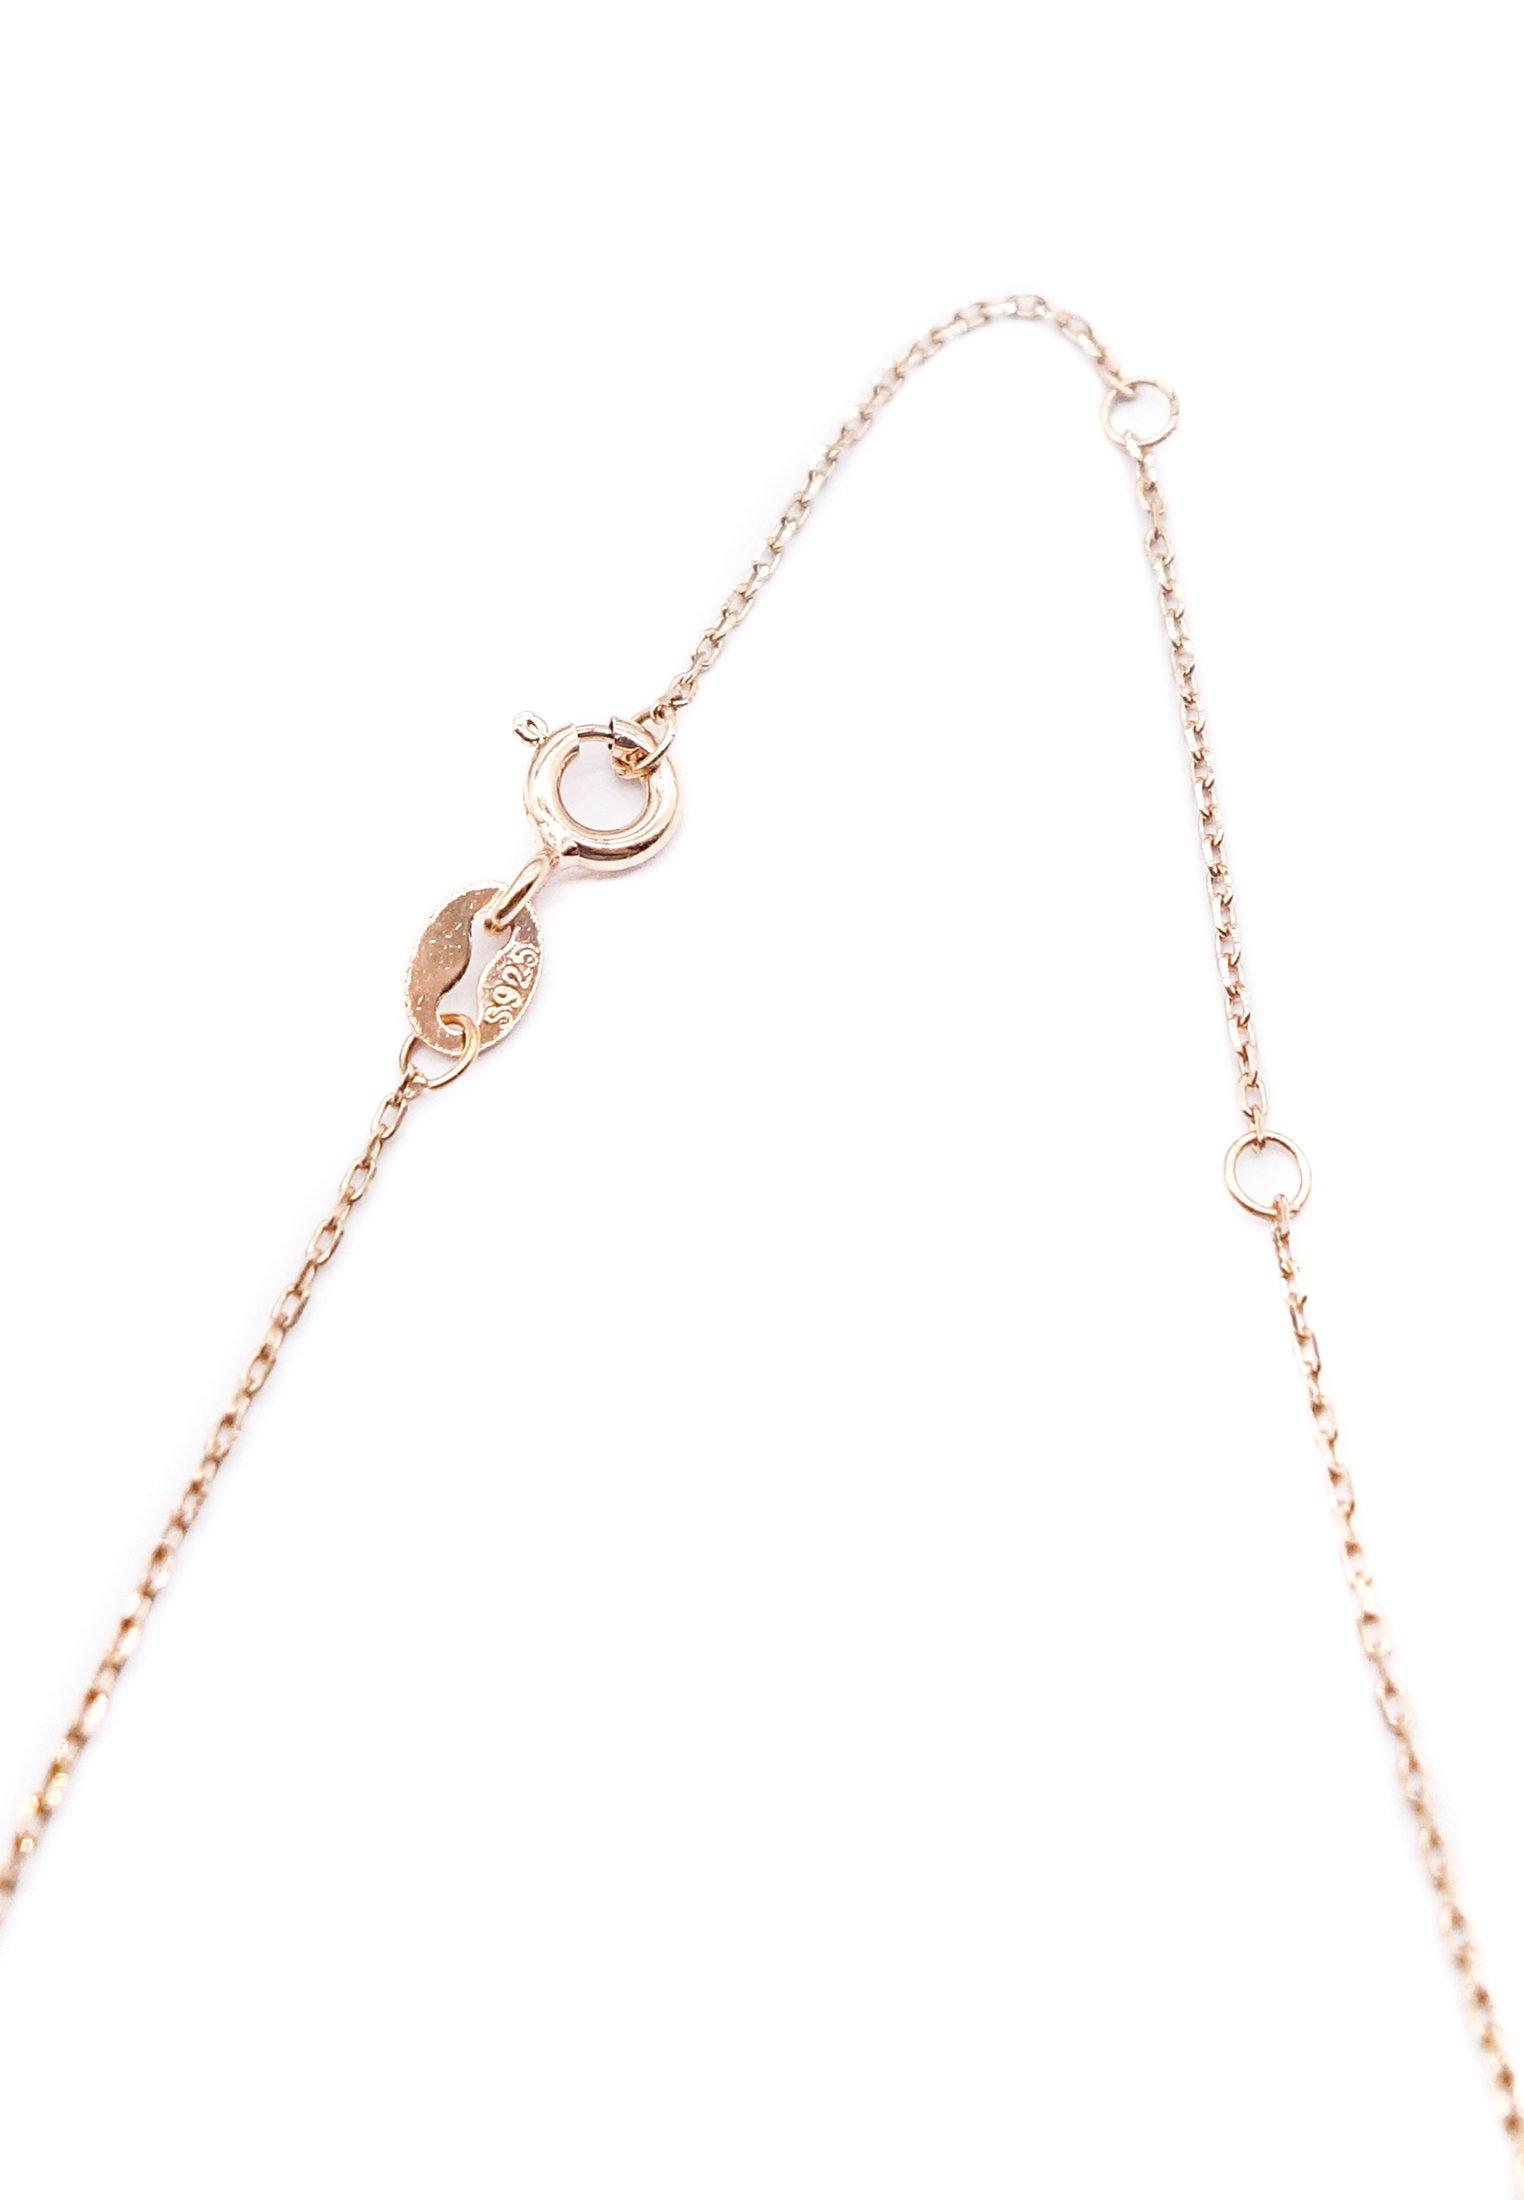 Arion Jewelry Halskette - Rose Gold-coloured/roségoldfarben